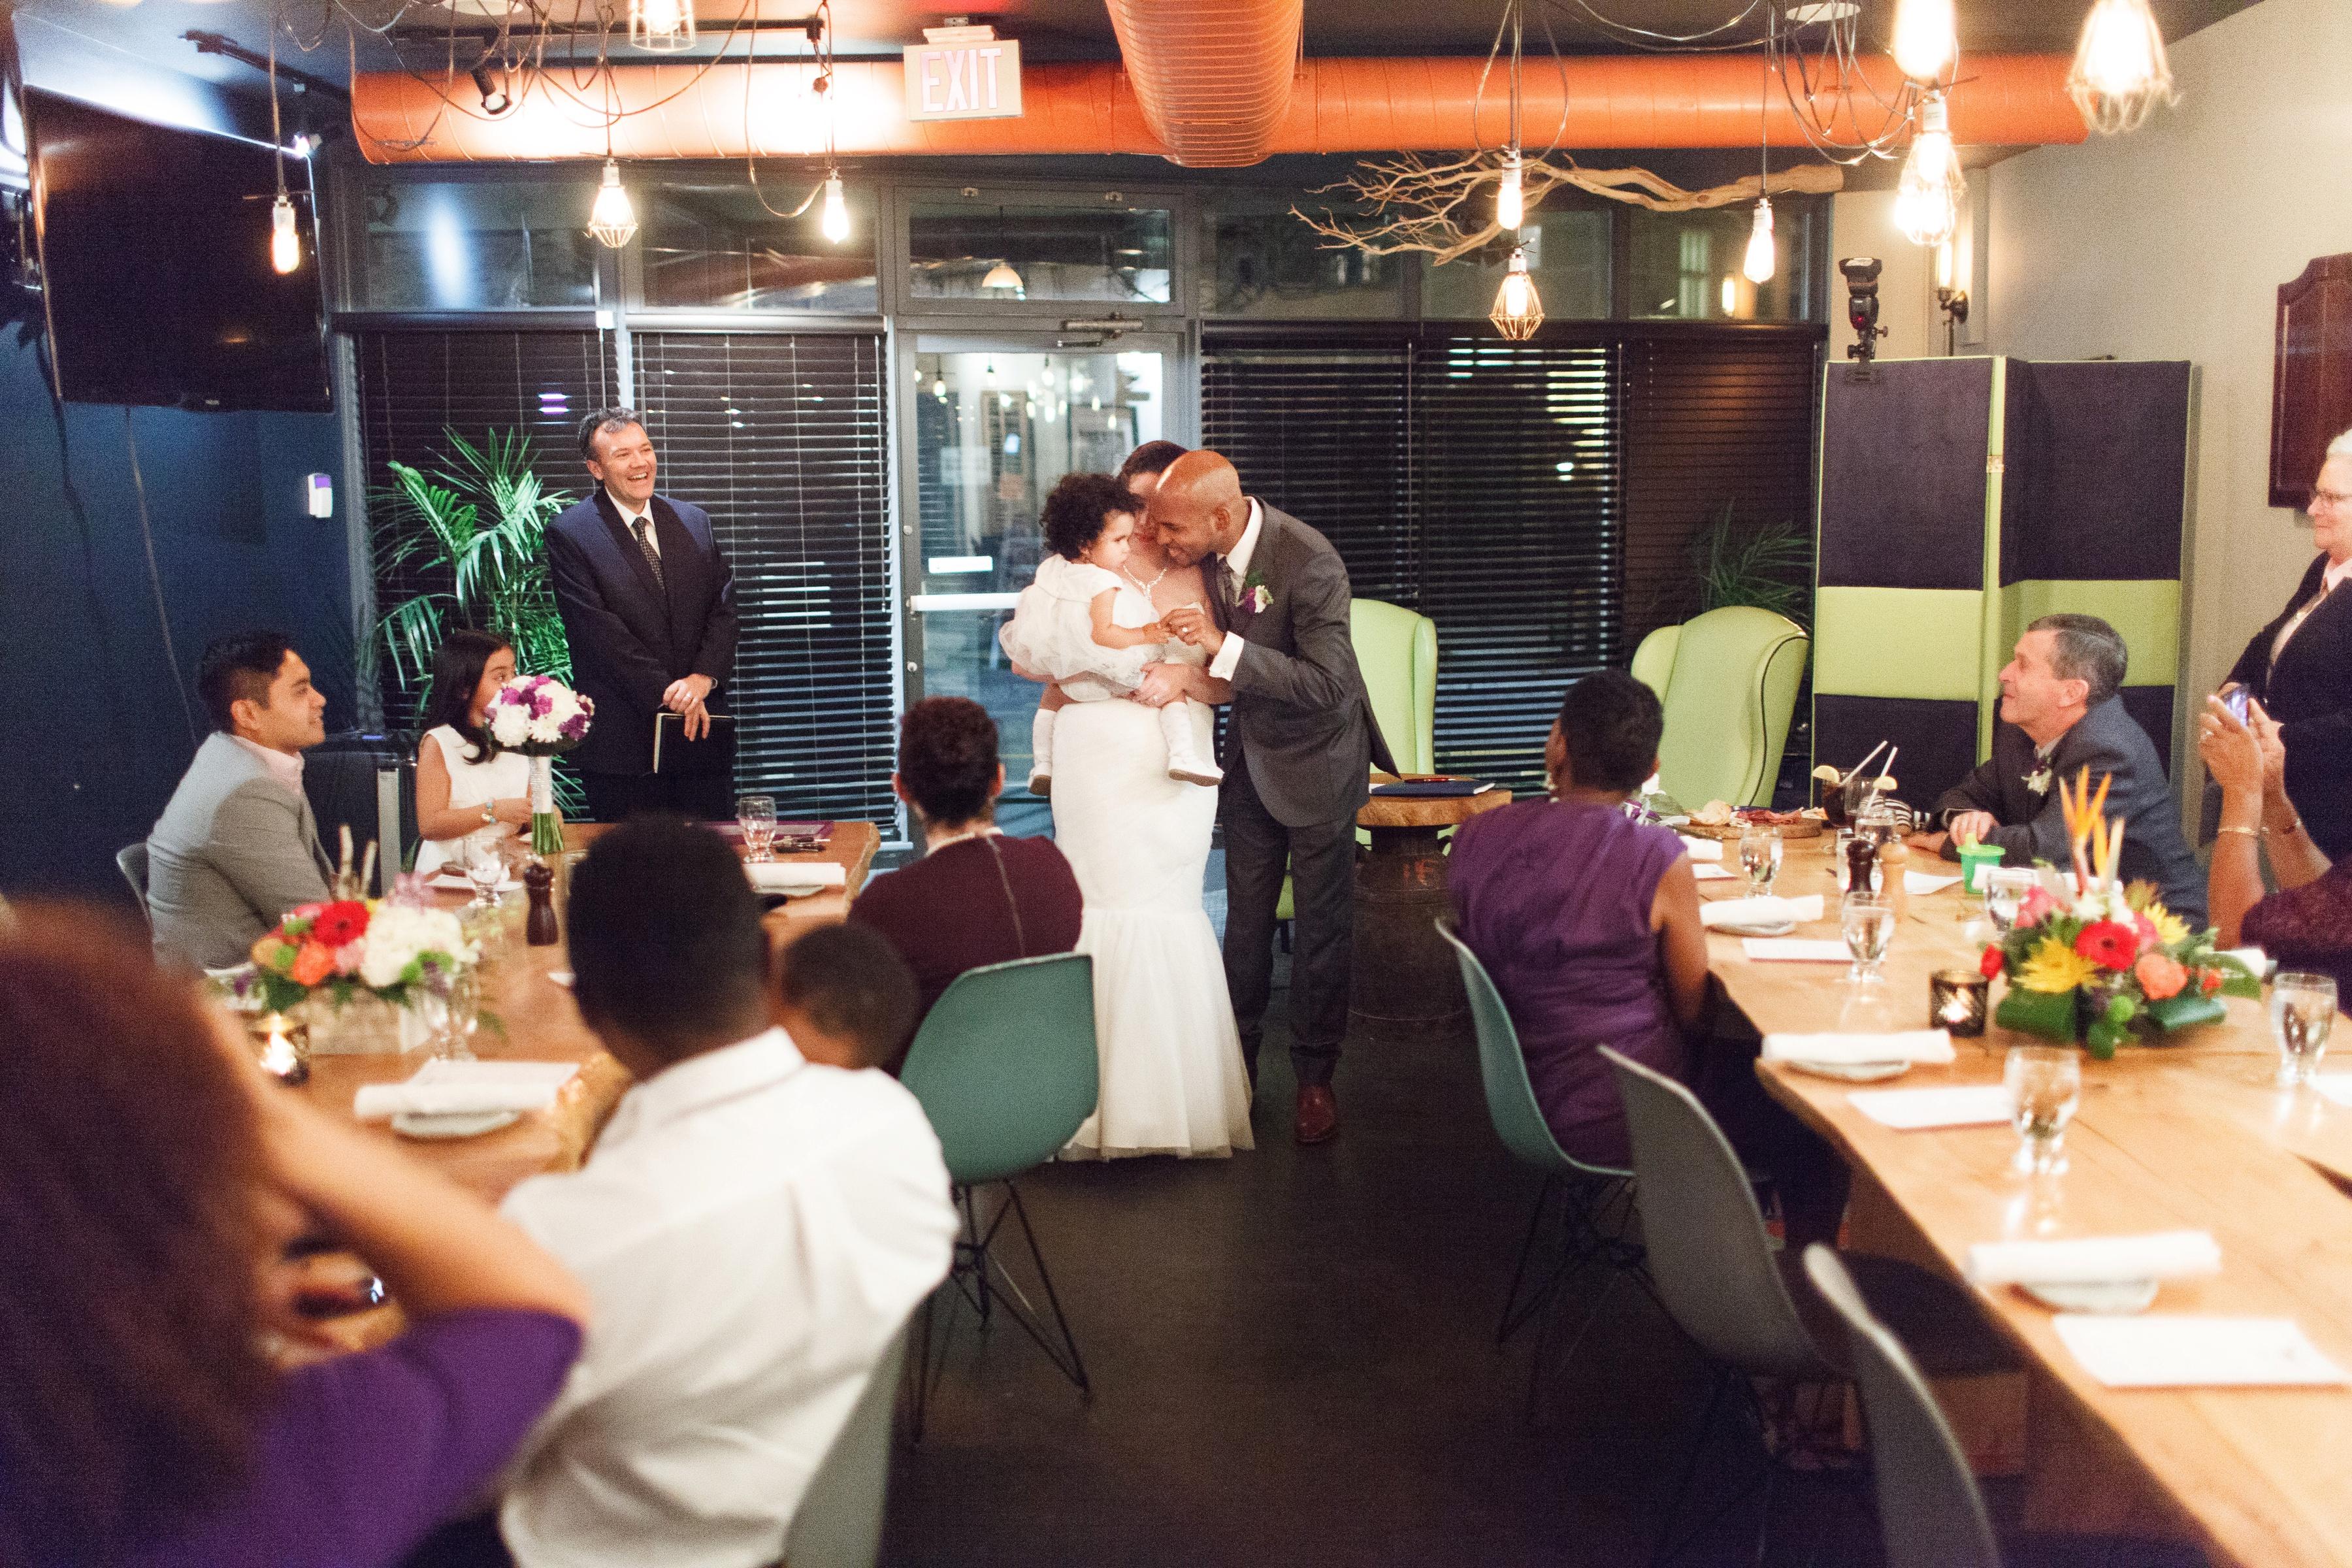 ottawa-fraser-cafe-wedding-venue